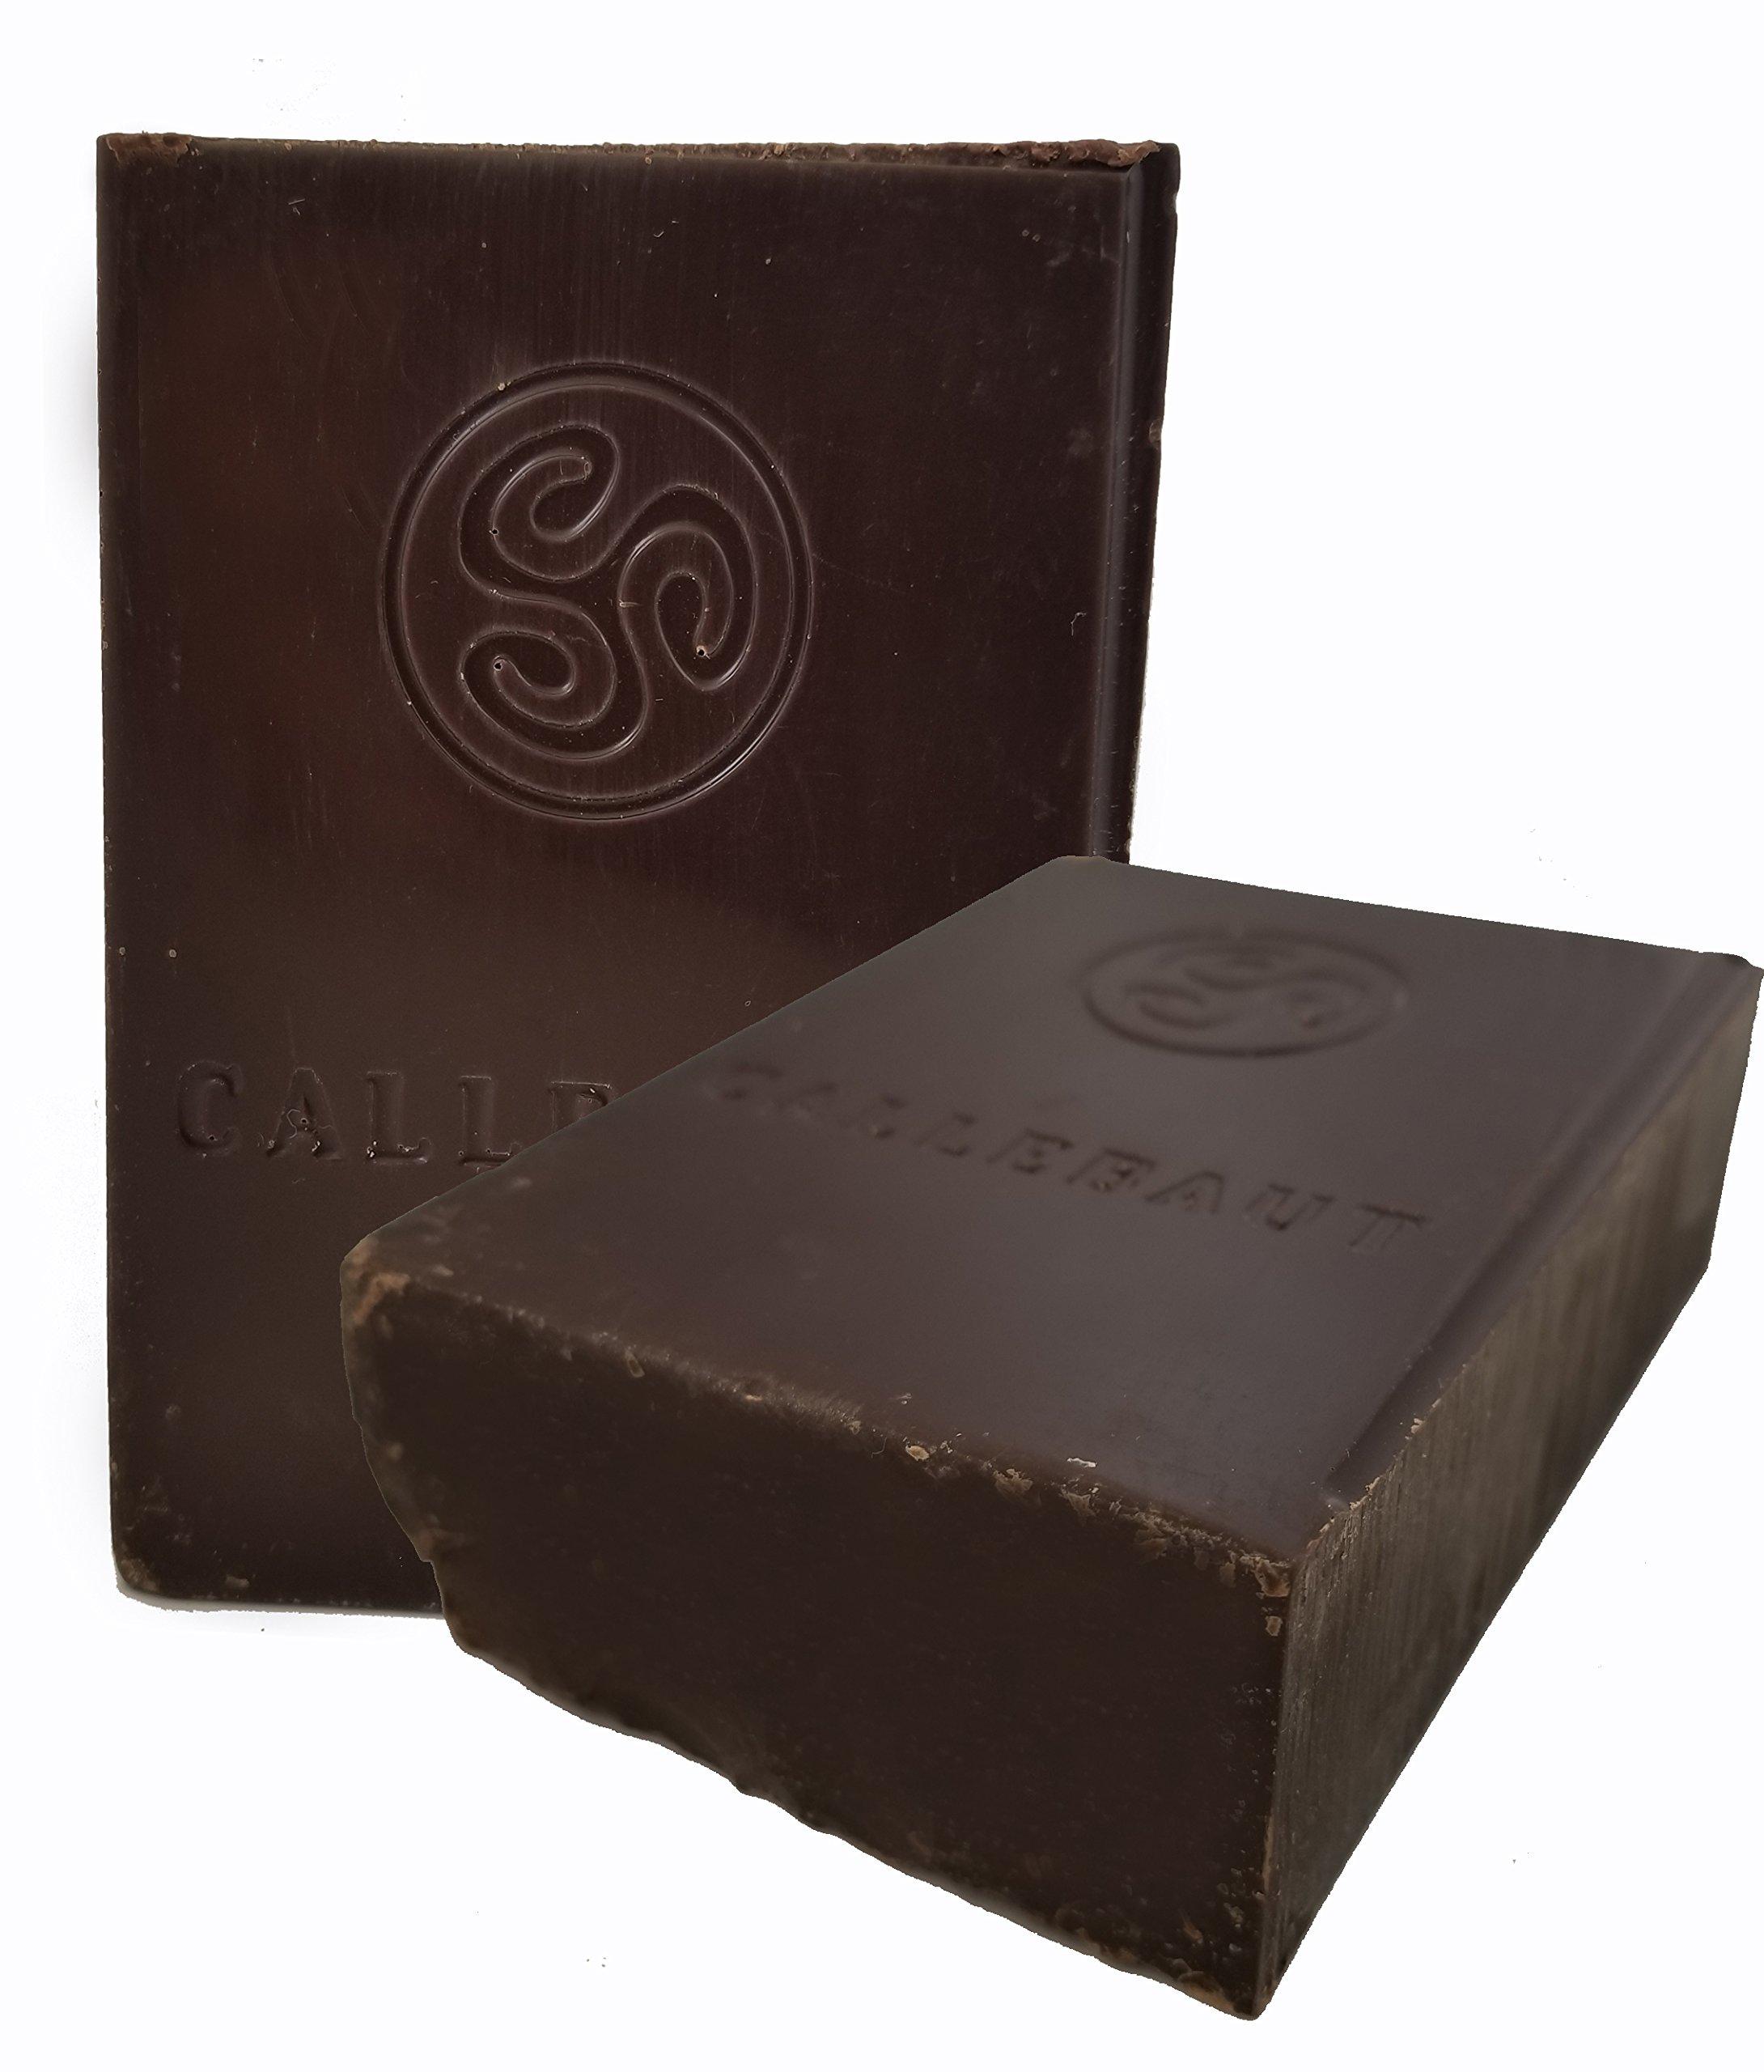 Callebaut Finest Belgian Semisweet Chocolate Blocks - Approximately 1 pound per Block - 2 Blocks